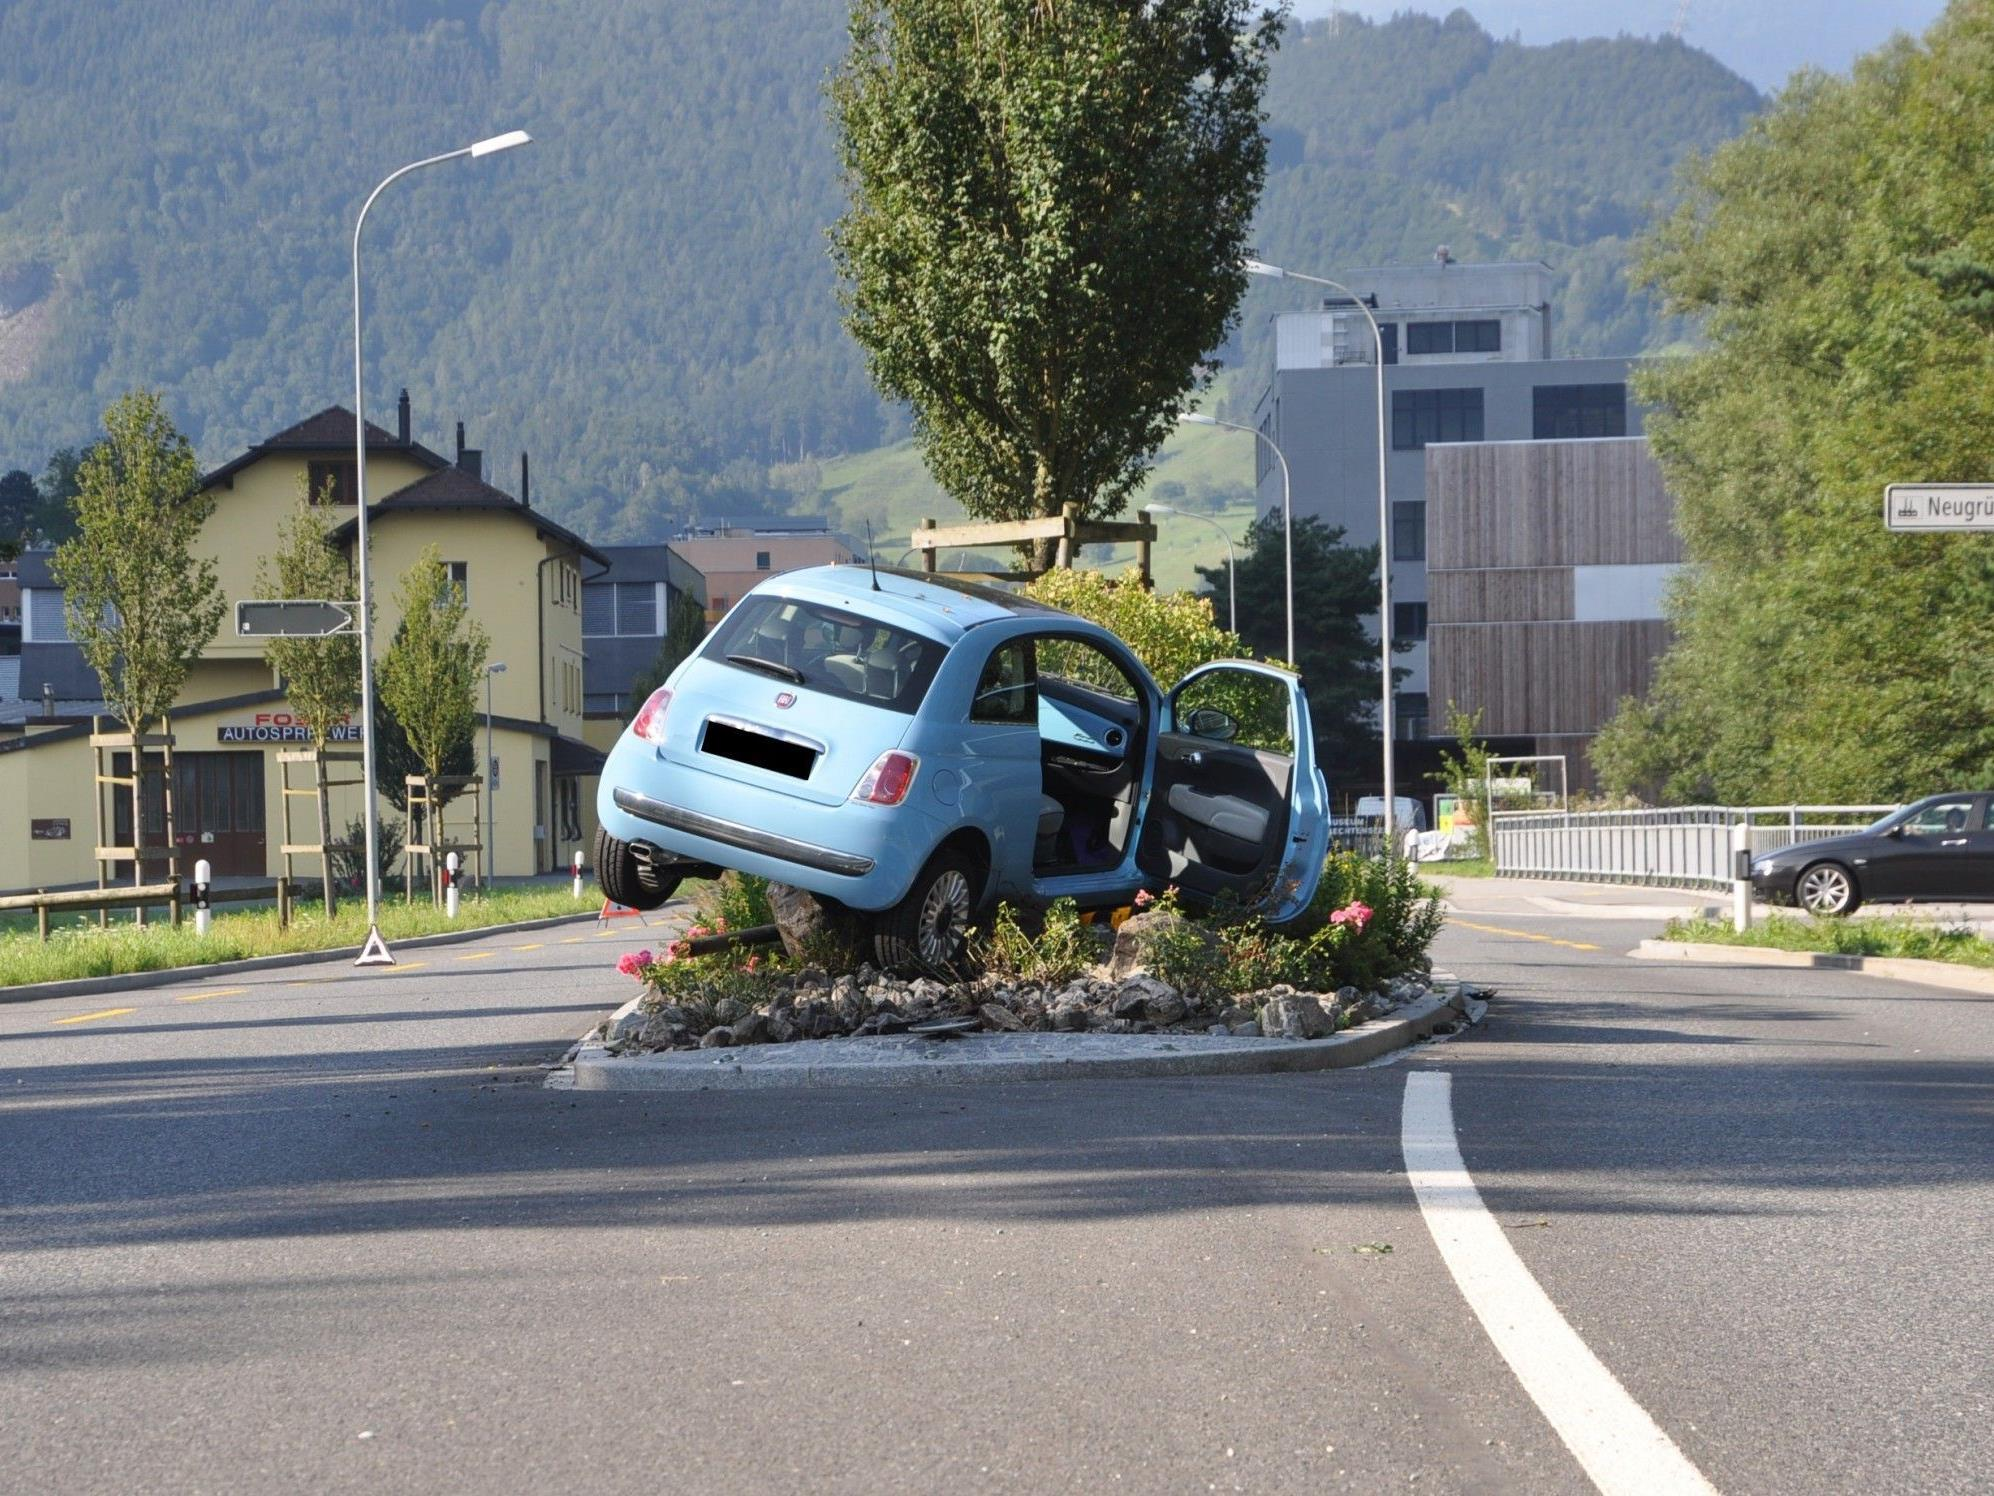 Spektakulärer Unfall in Balzers